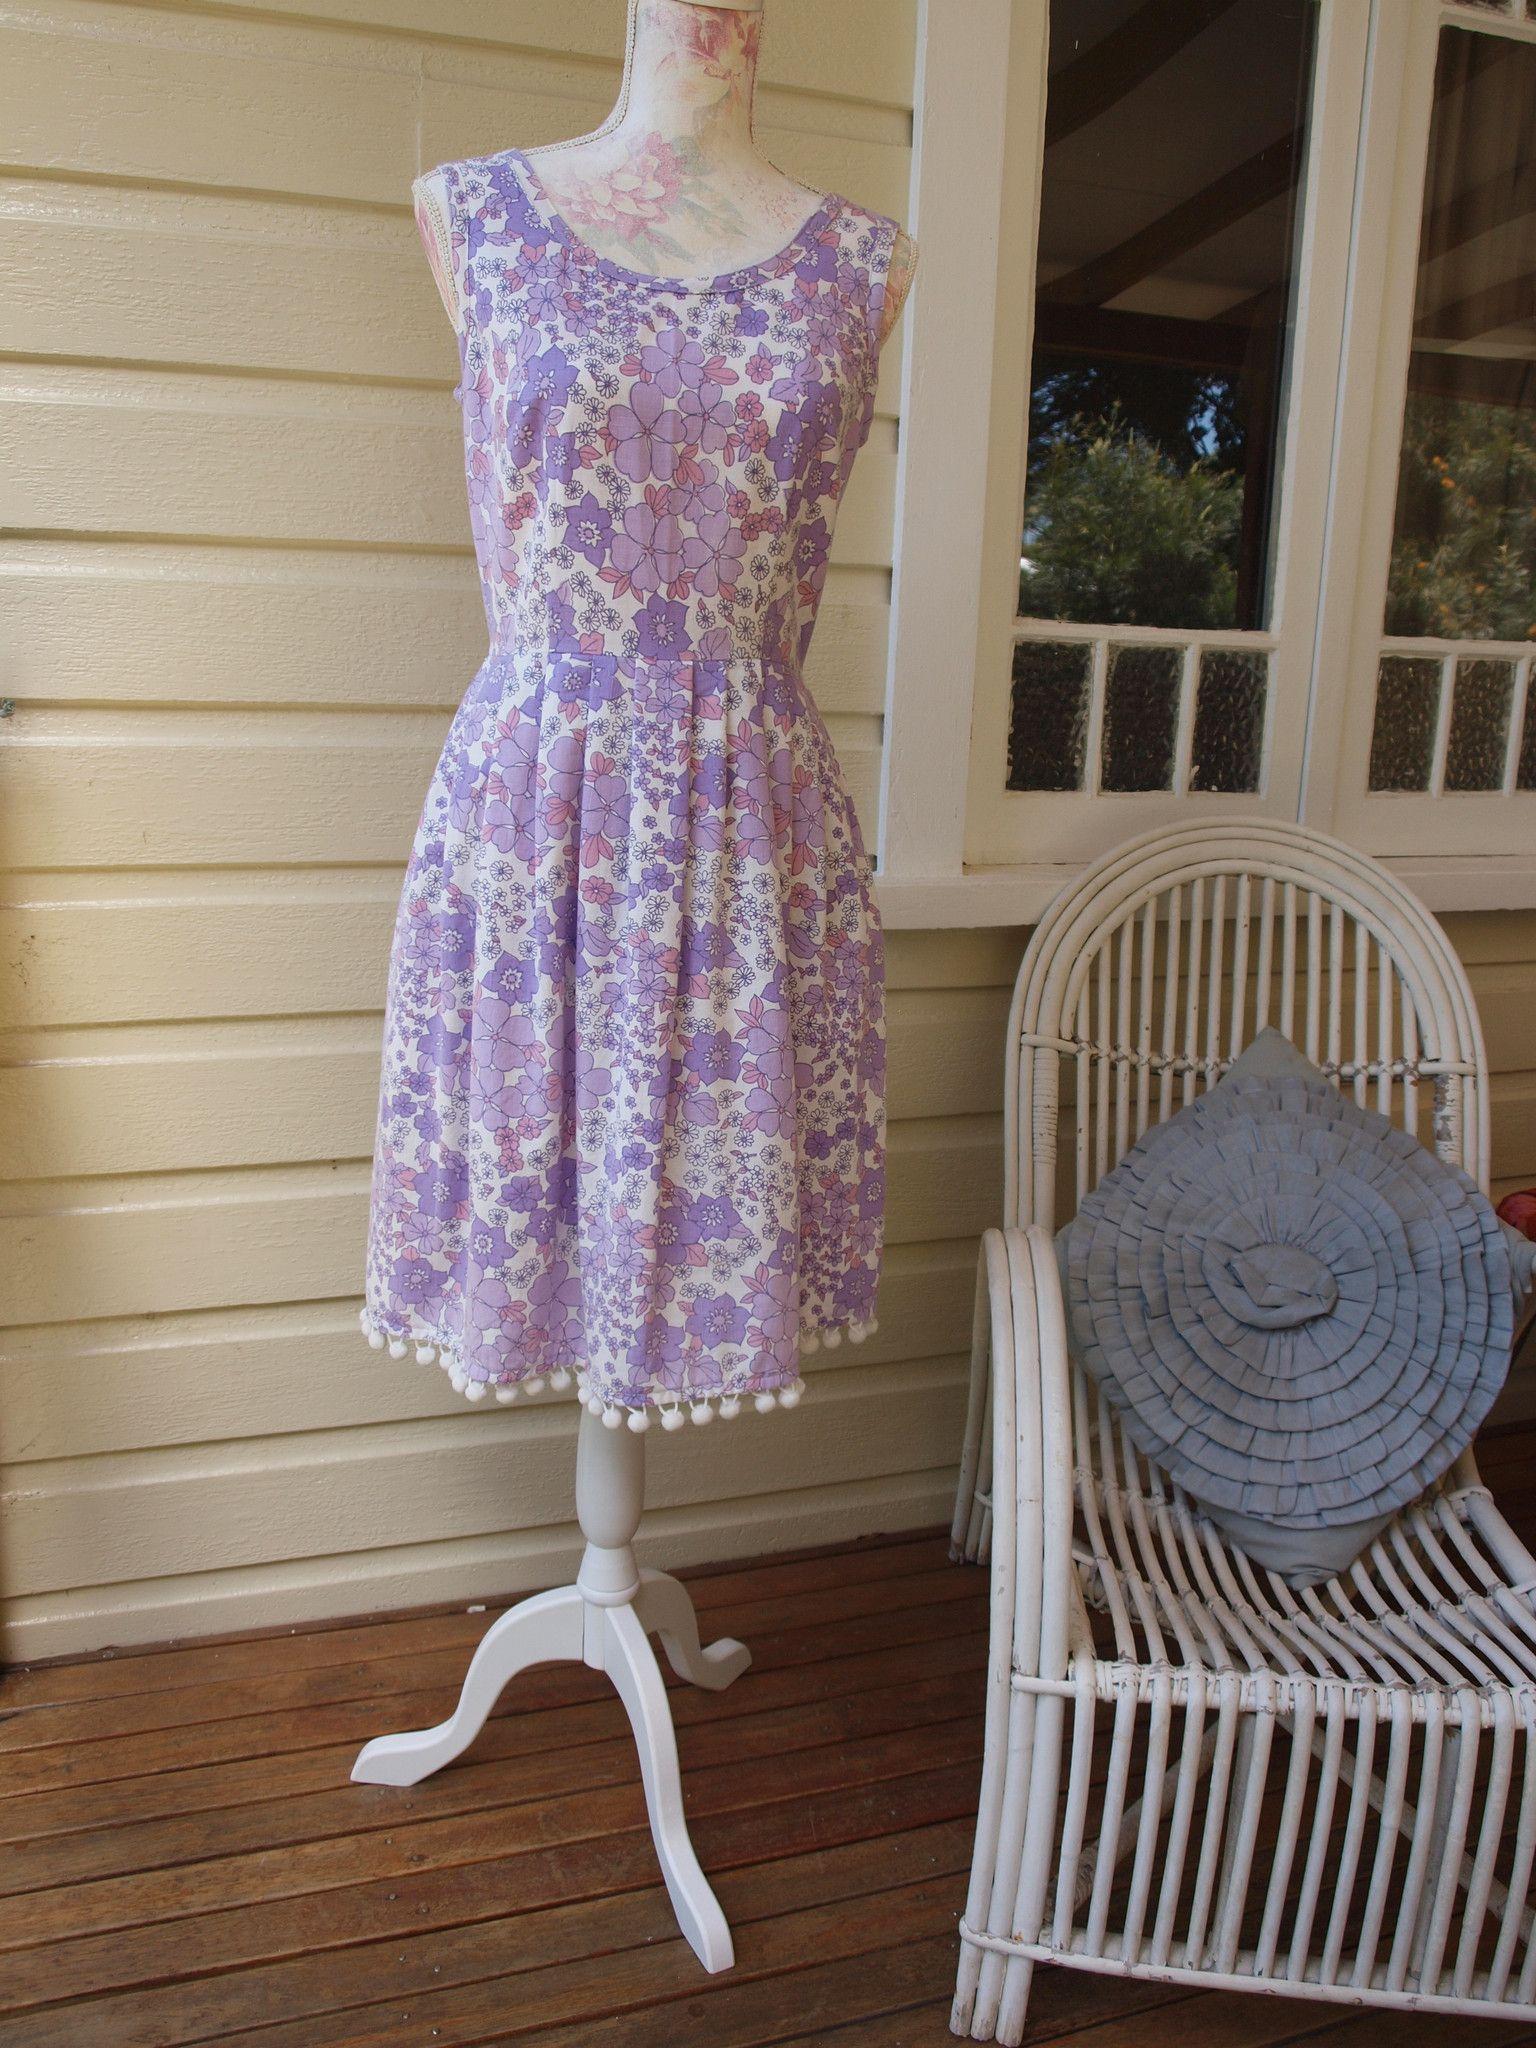 Jacca Bloom Hazel Dress sz10 by Dear Hazel, upcycled vintage fabric with pompoms!